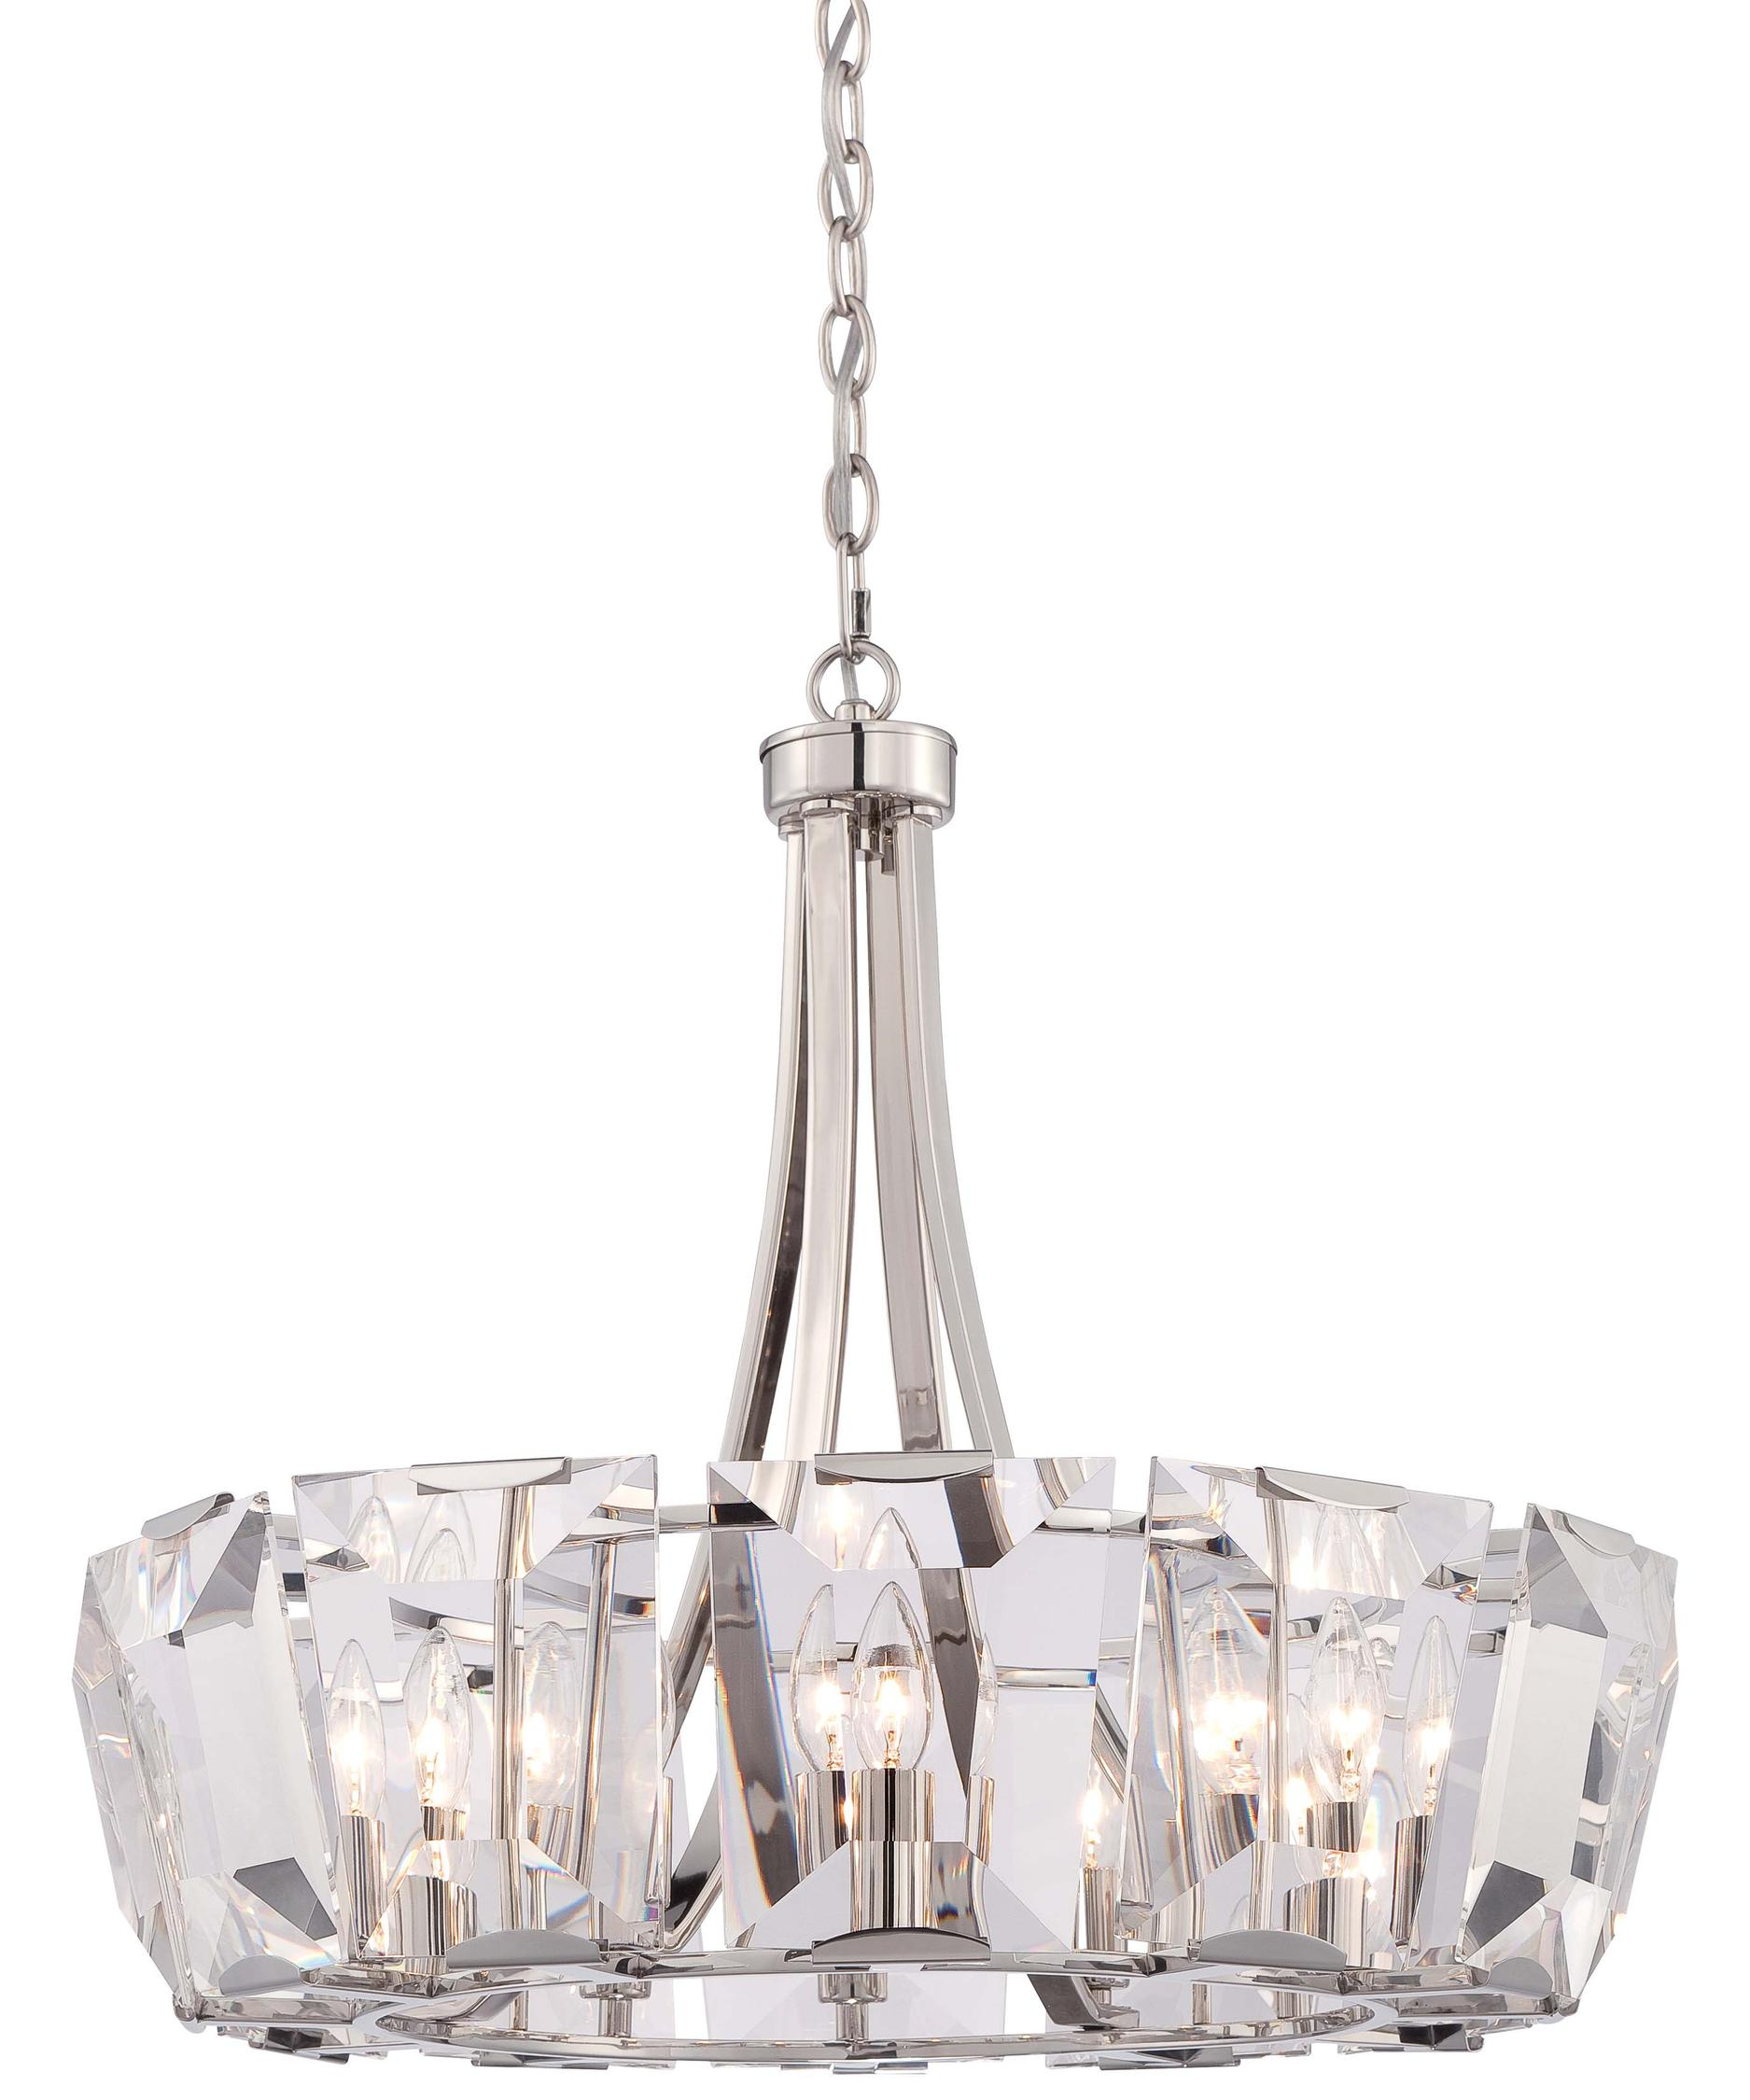 Polished nickel chandelier